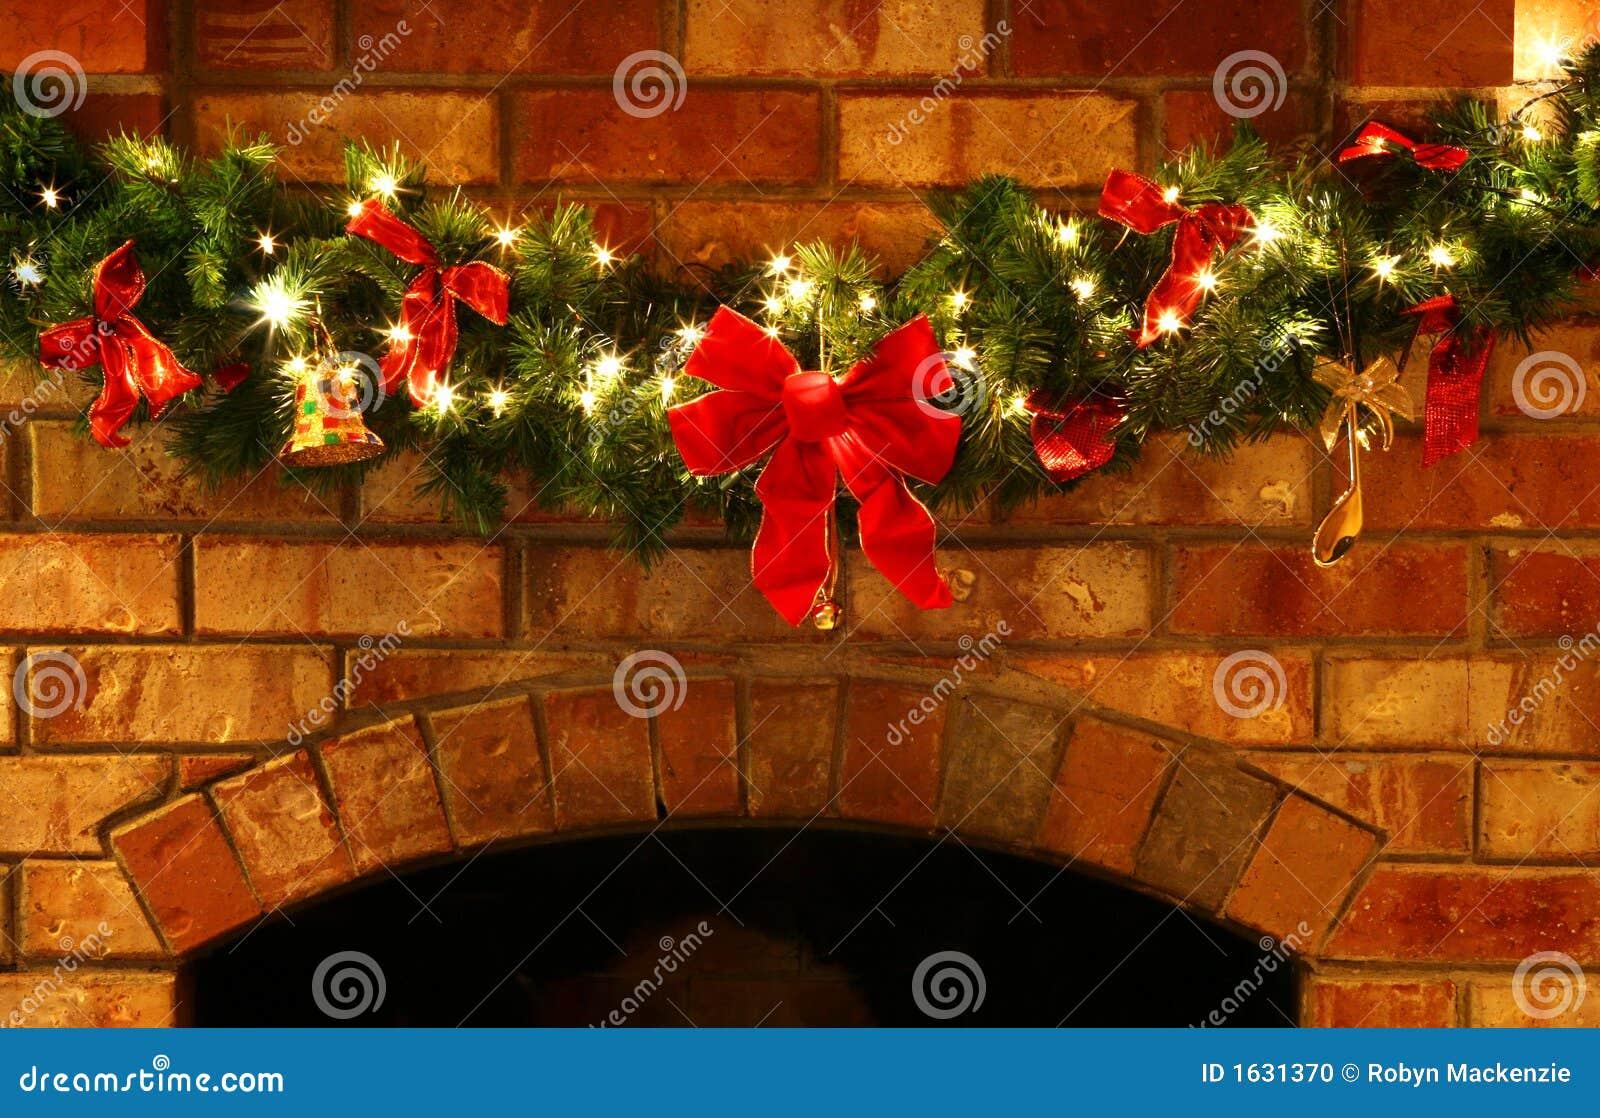 Julgirlandlampor